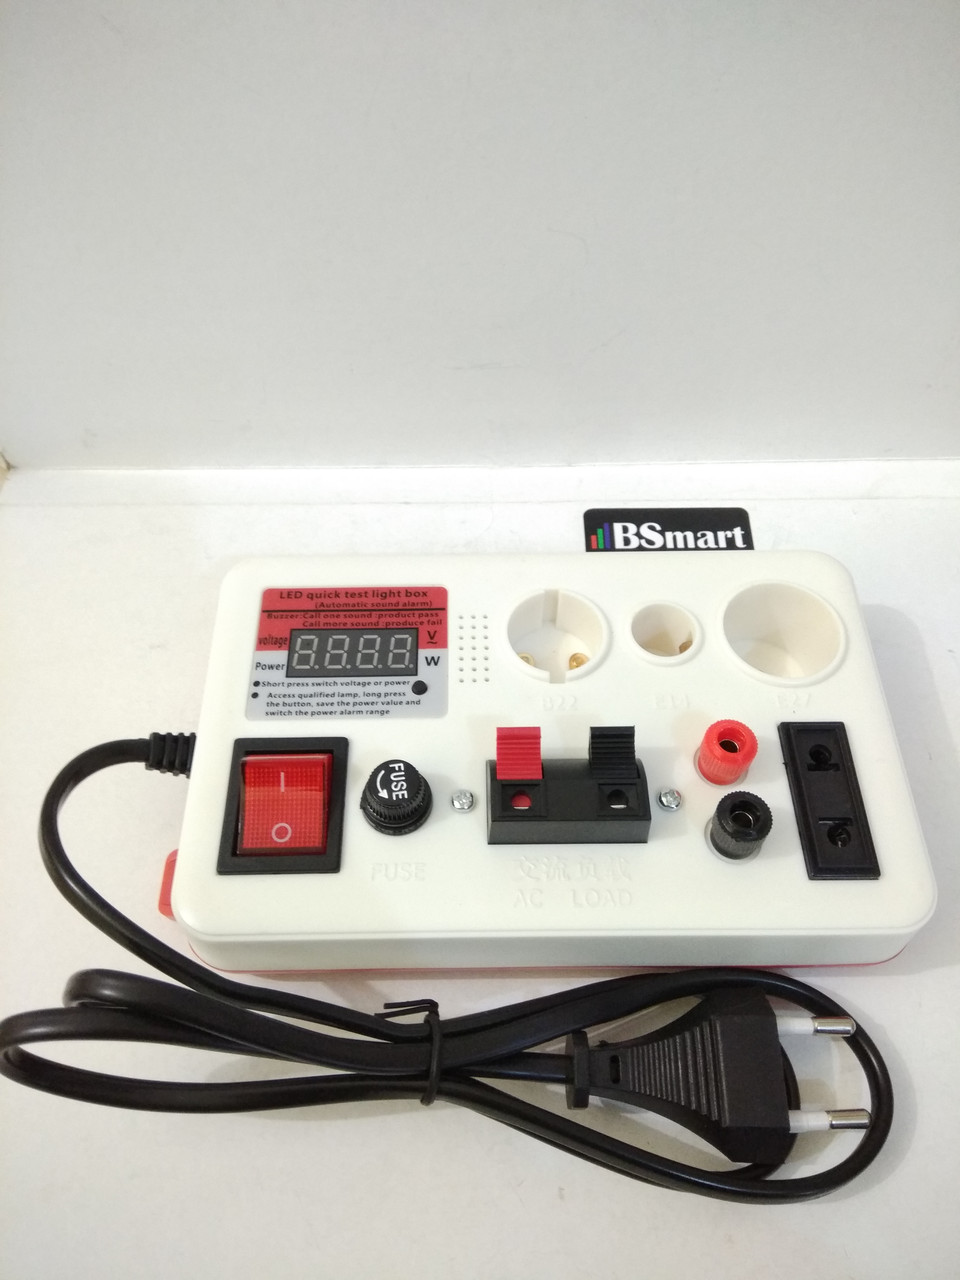 Тестер для проверки ламп c дисплеем, пробник на 3 патрона Е27, Е14, GU10, разьёми